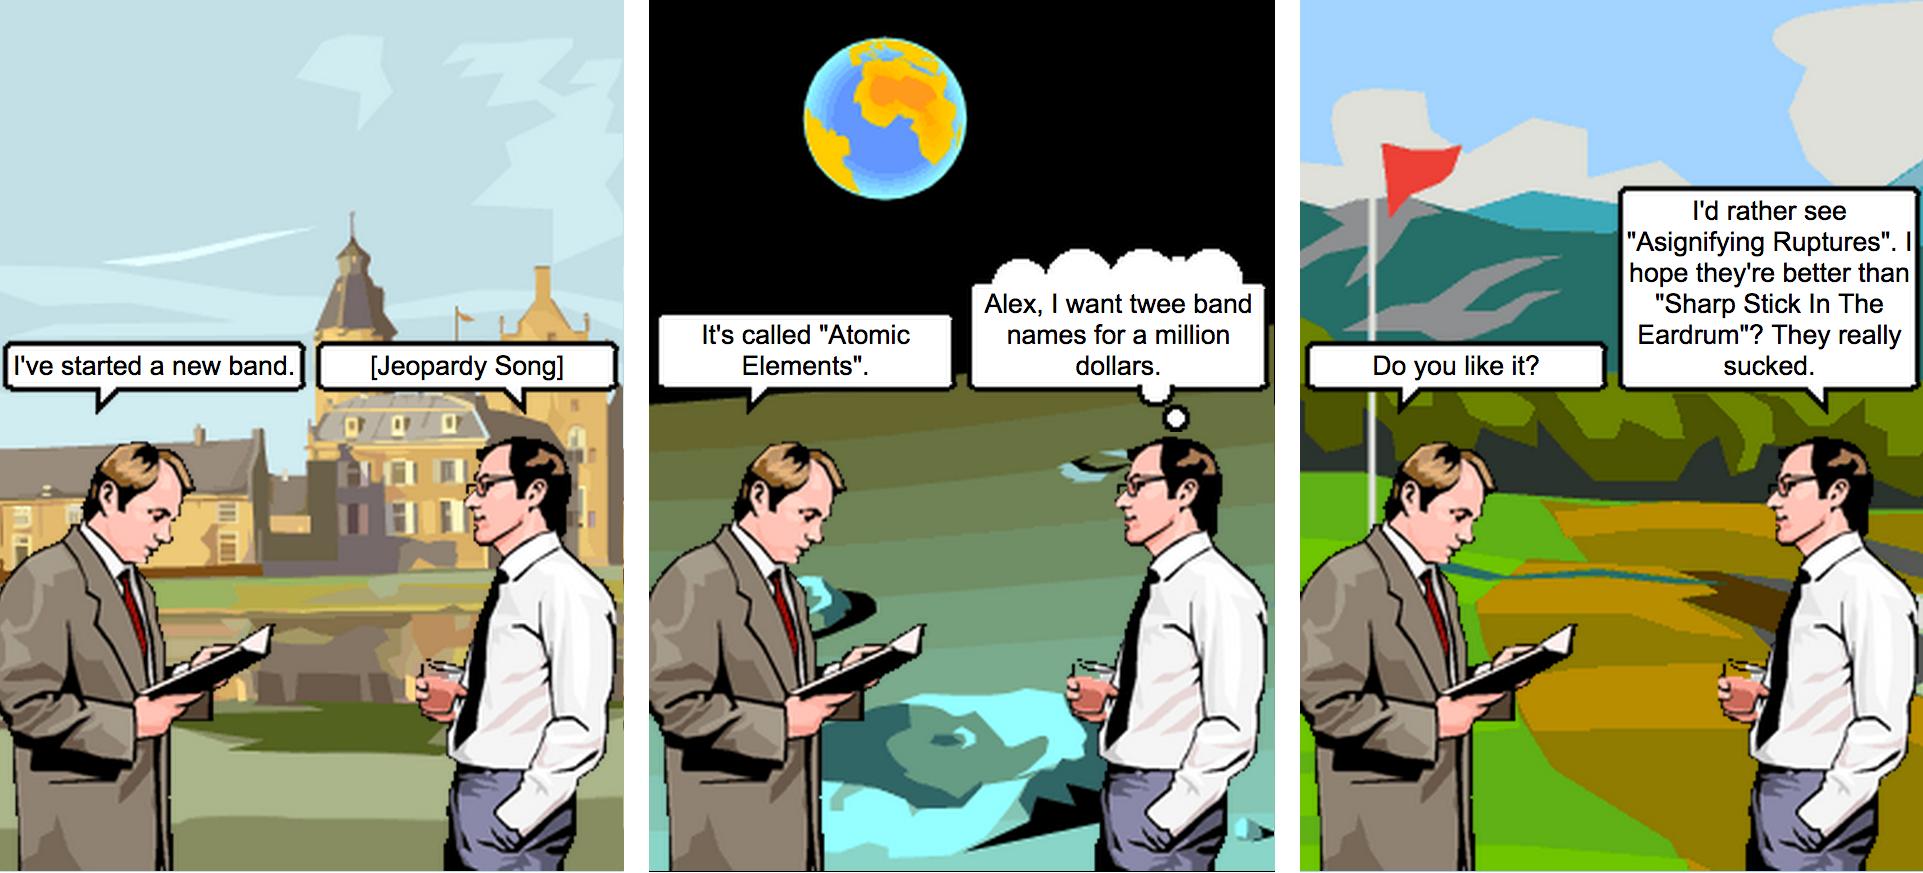 atomicelements